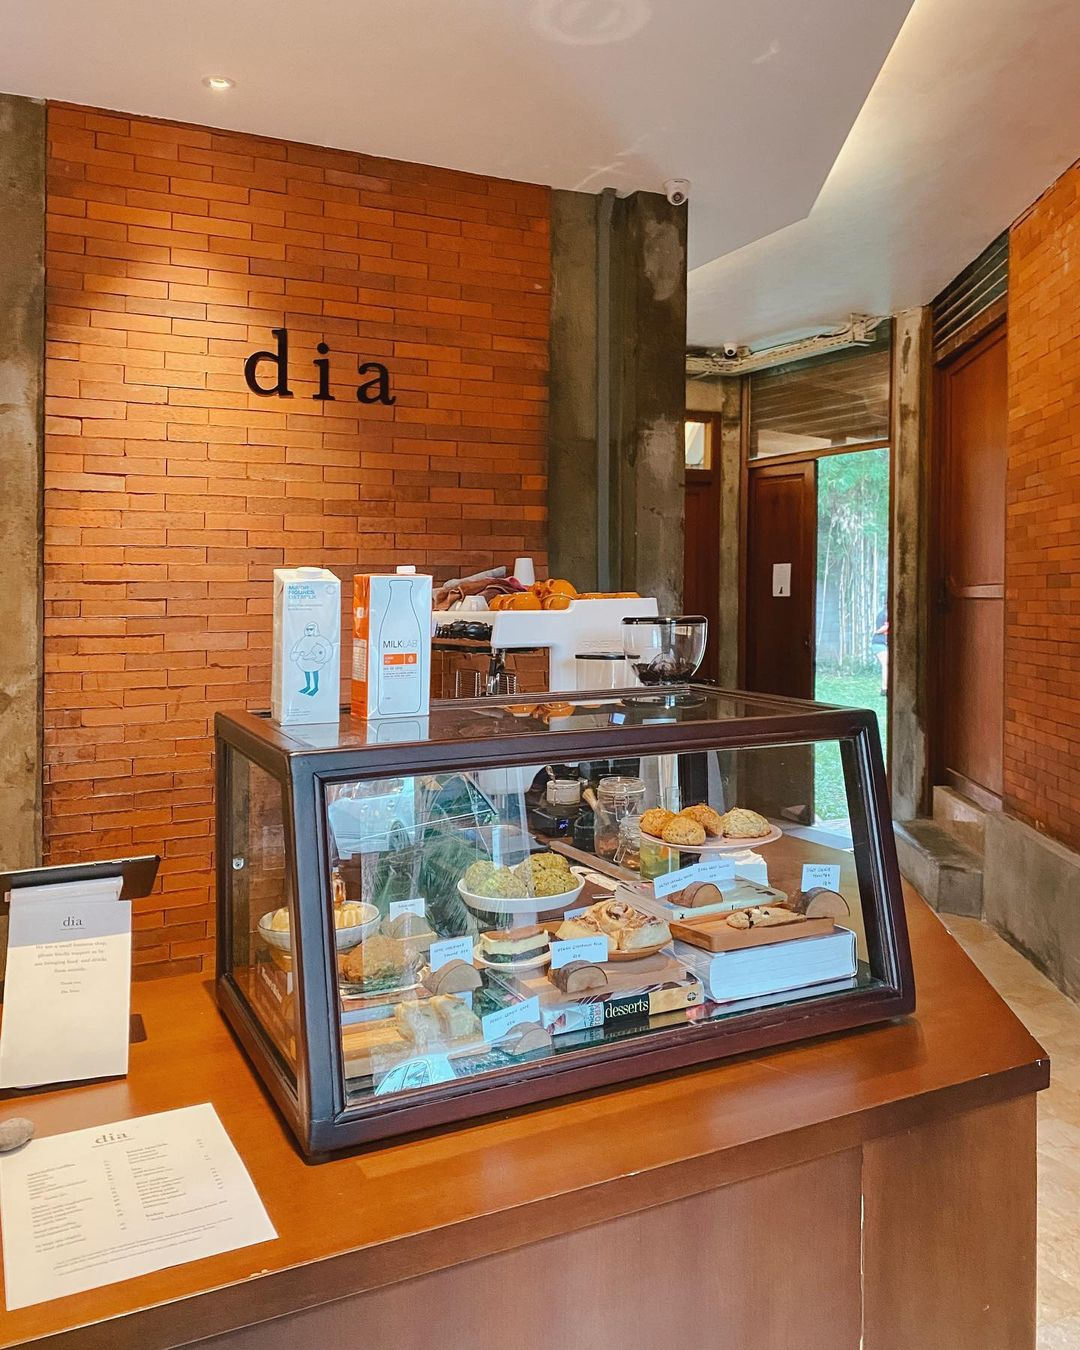 Tempat Memesan Di Cafe Dia Jakarta Image From @vanissakaris